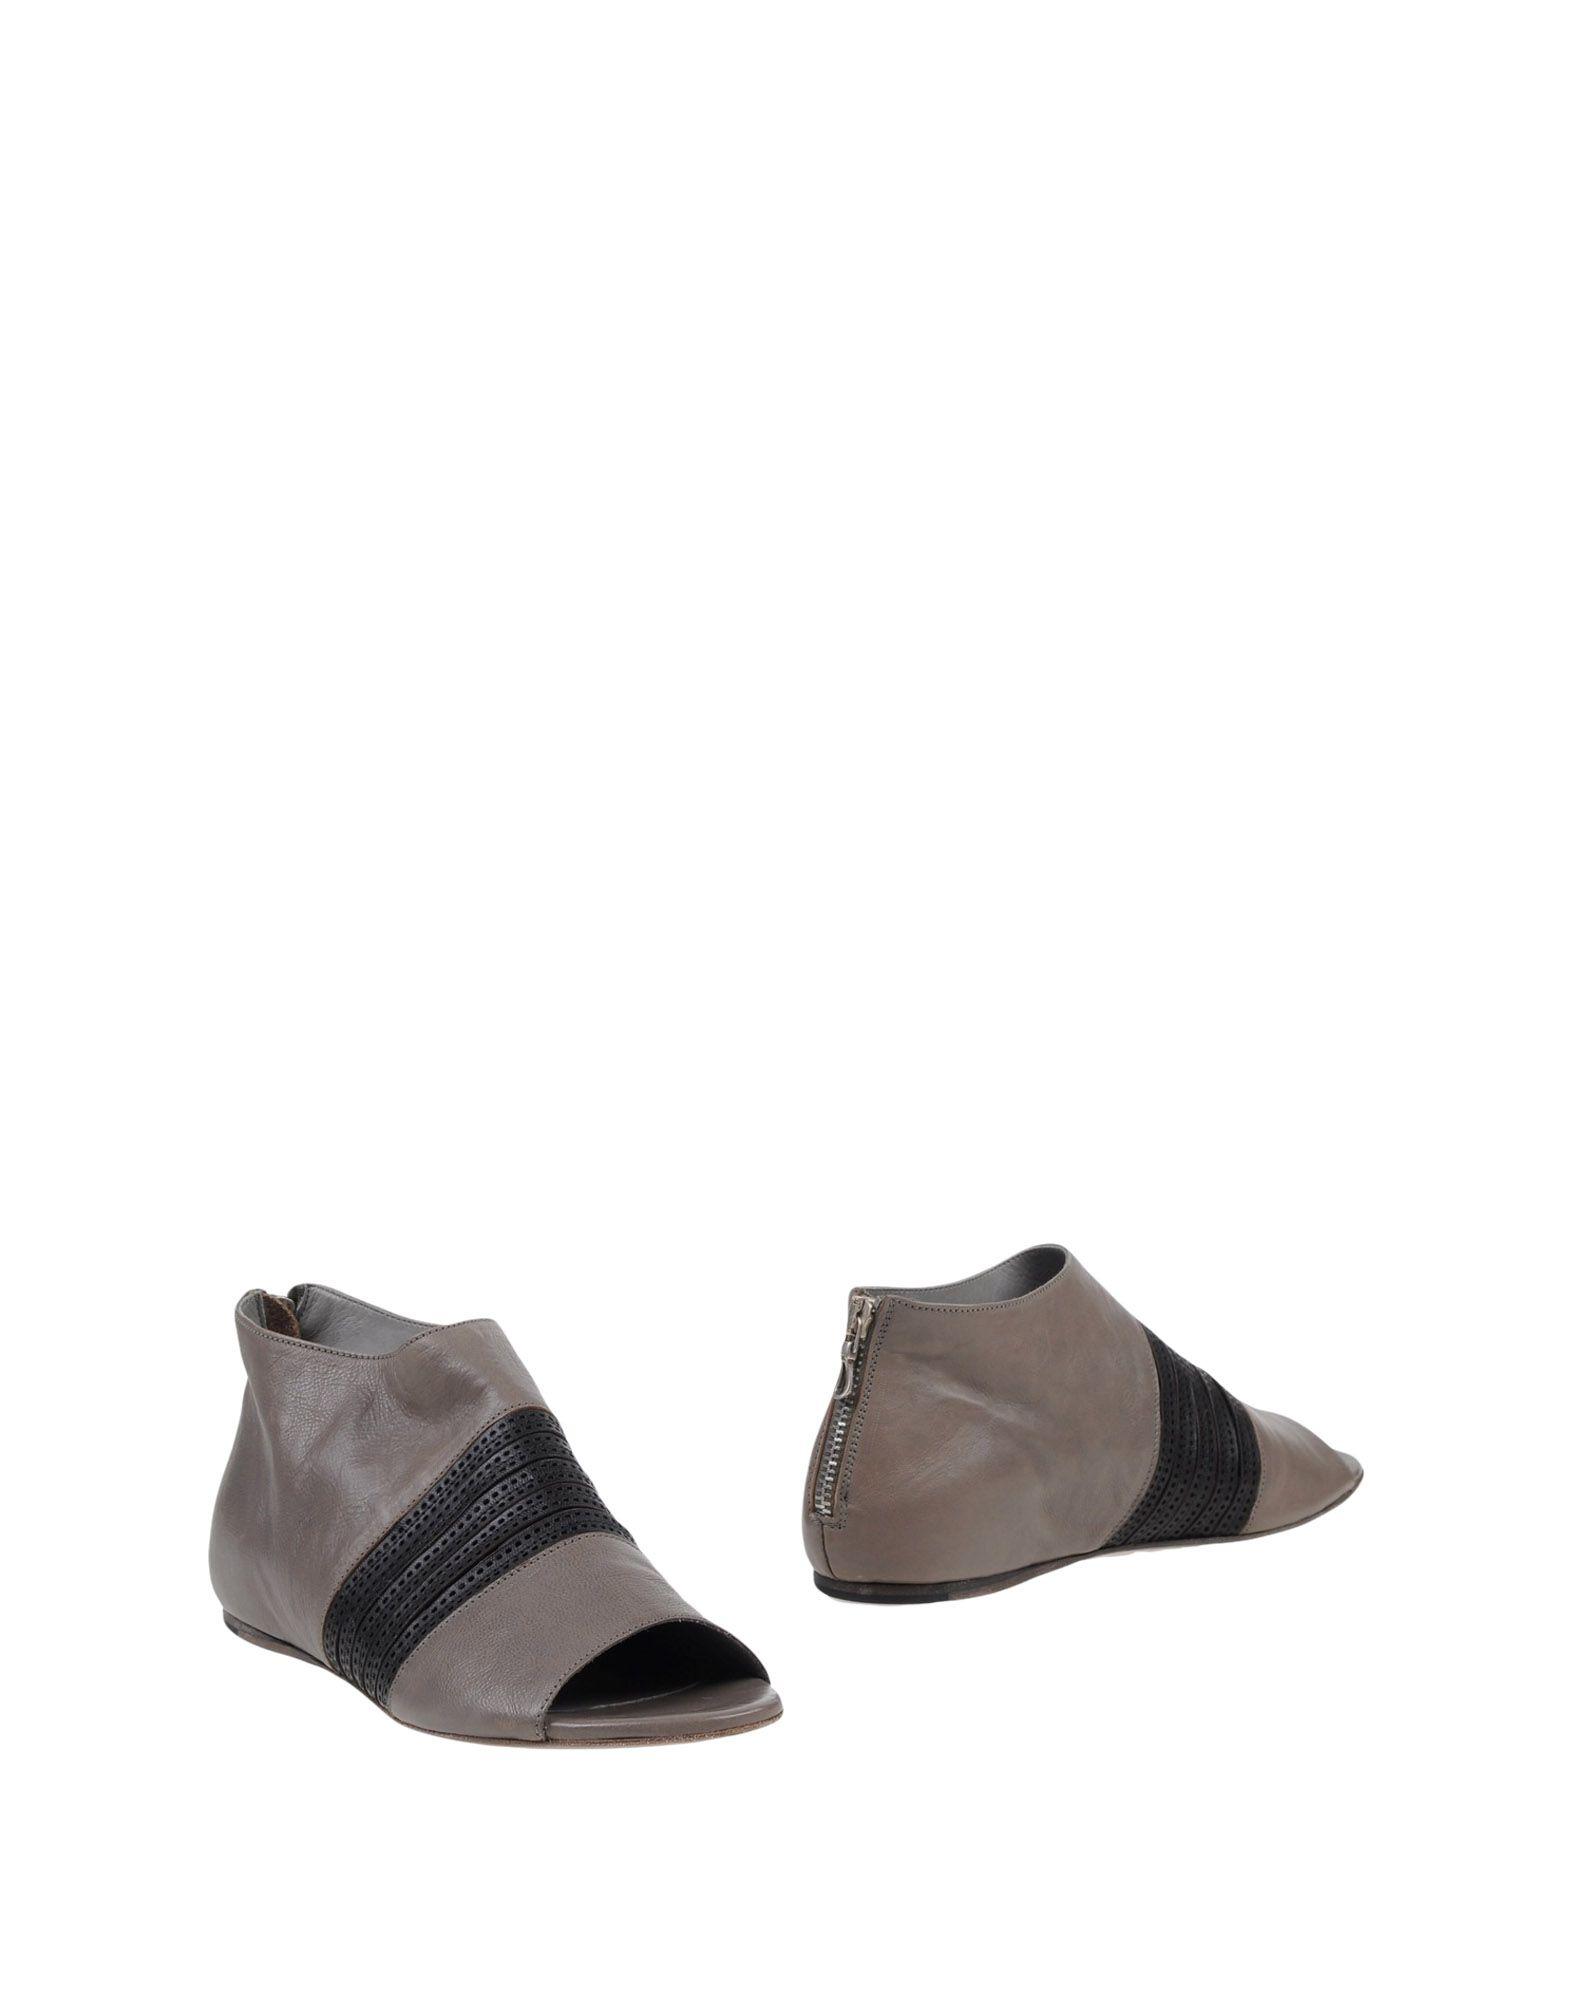 Ink 11120101JE Stiefelette Damen  11120101JE Ink Gute Qualität beliebte Schuhe 82f9da